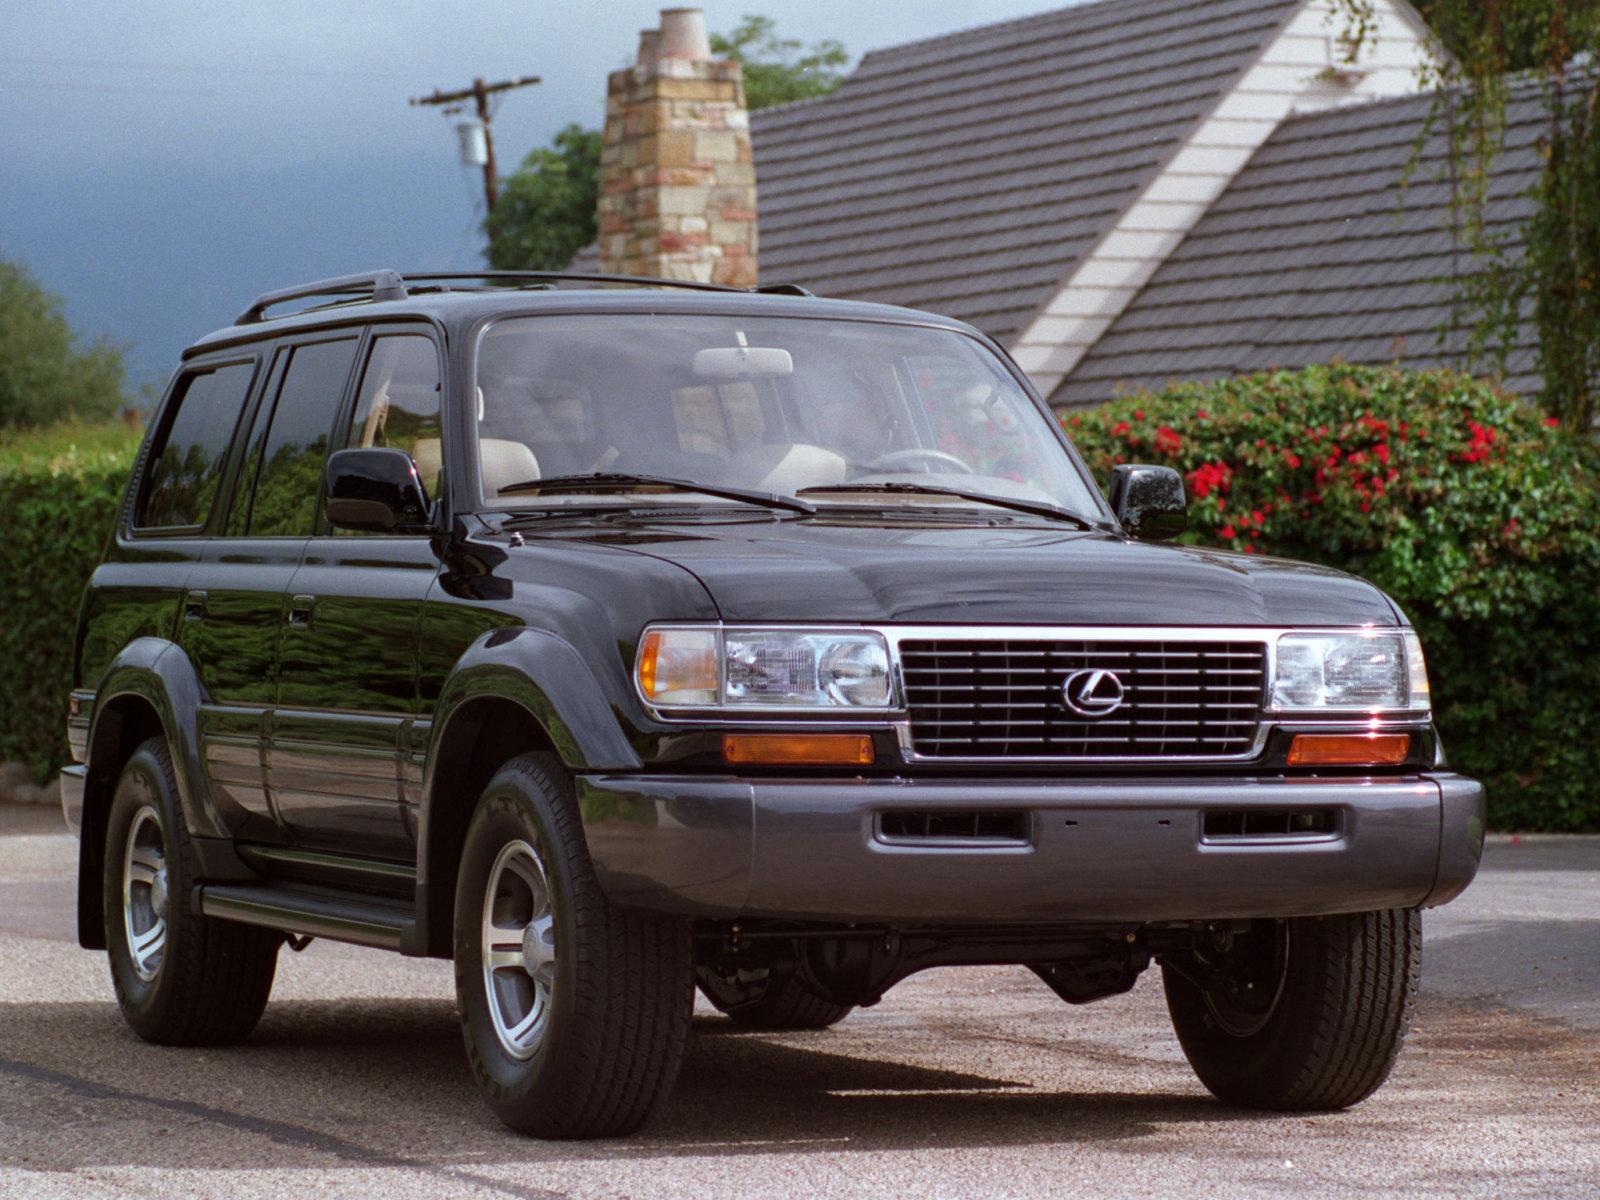 Lexus_LX_LX-450_SUV-5-door_1996.jpg